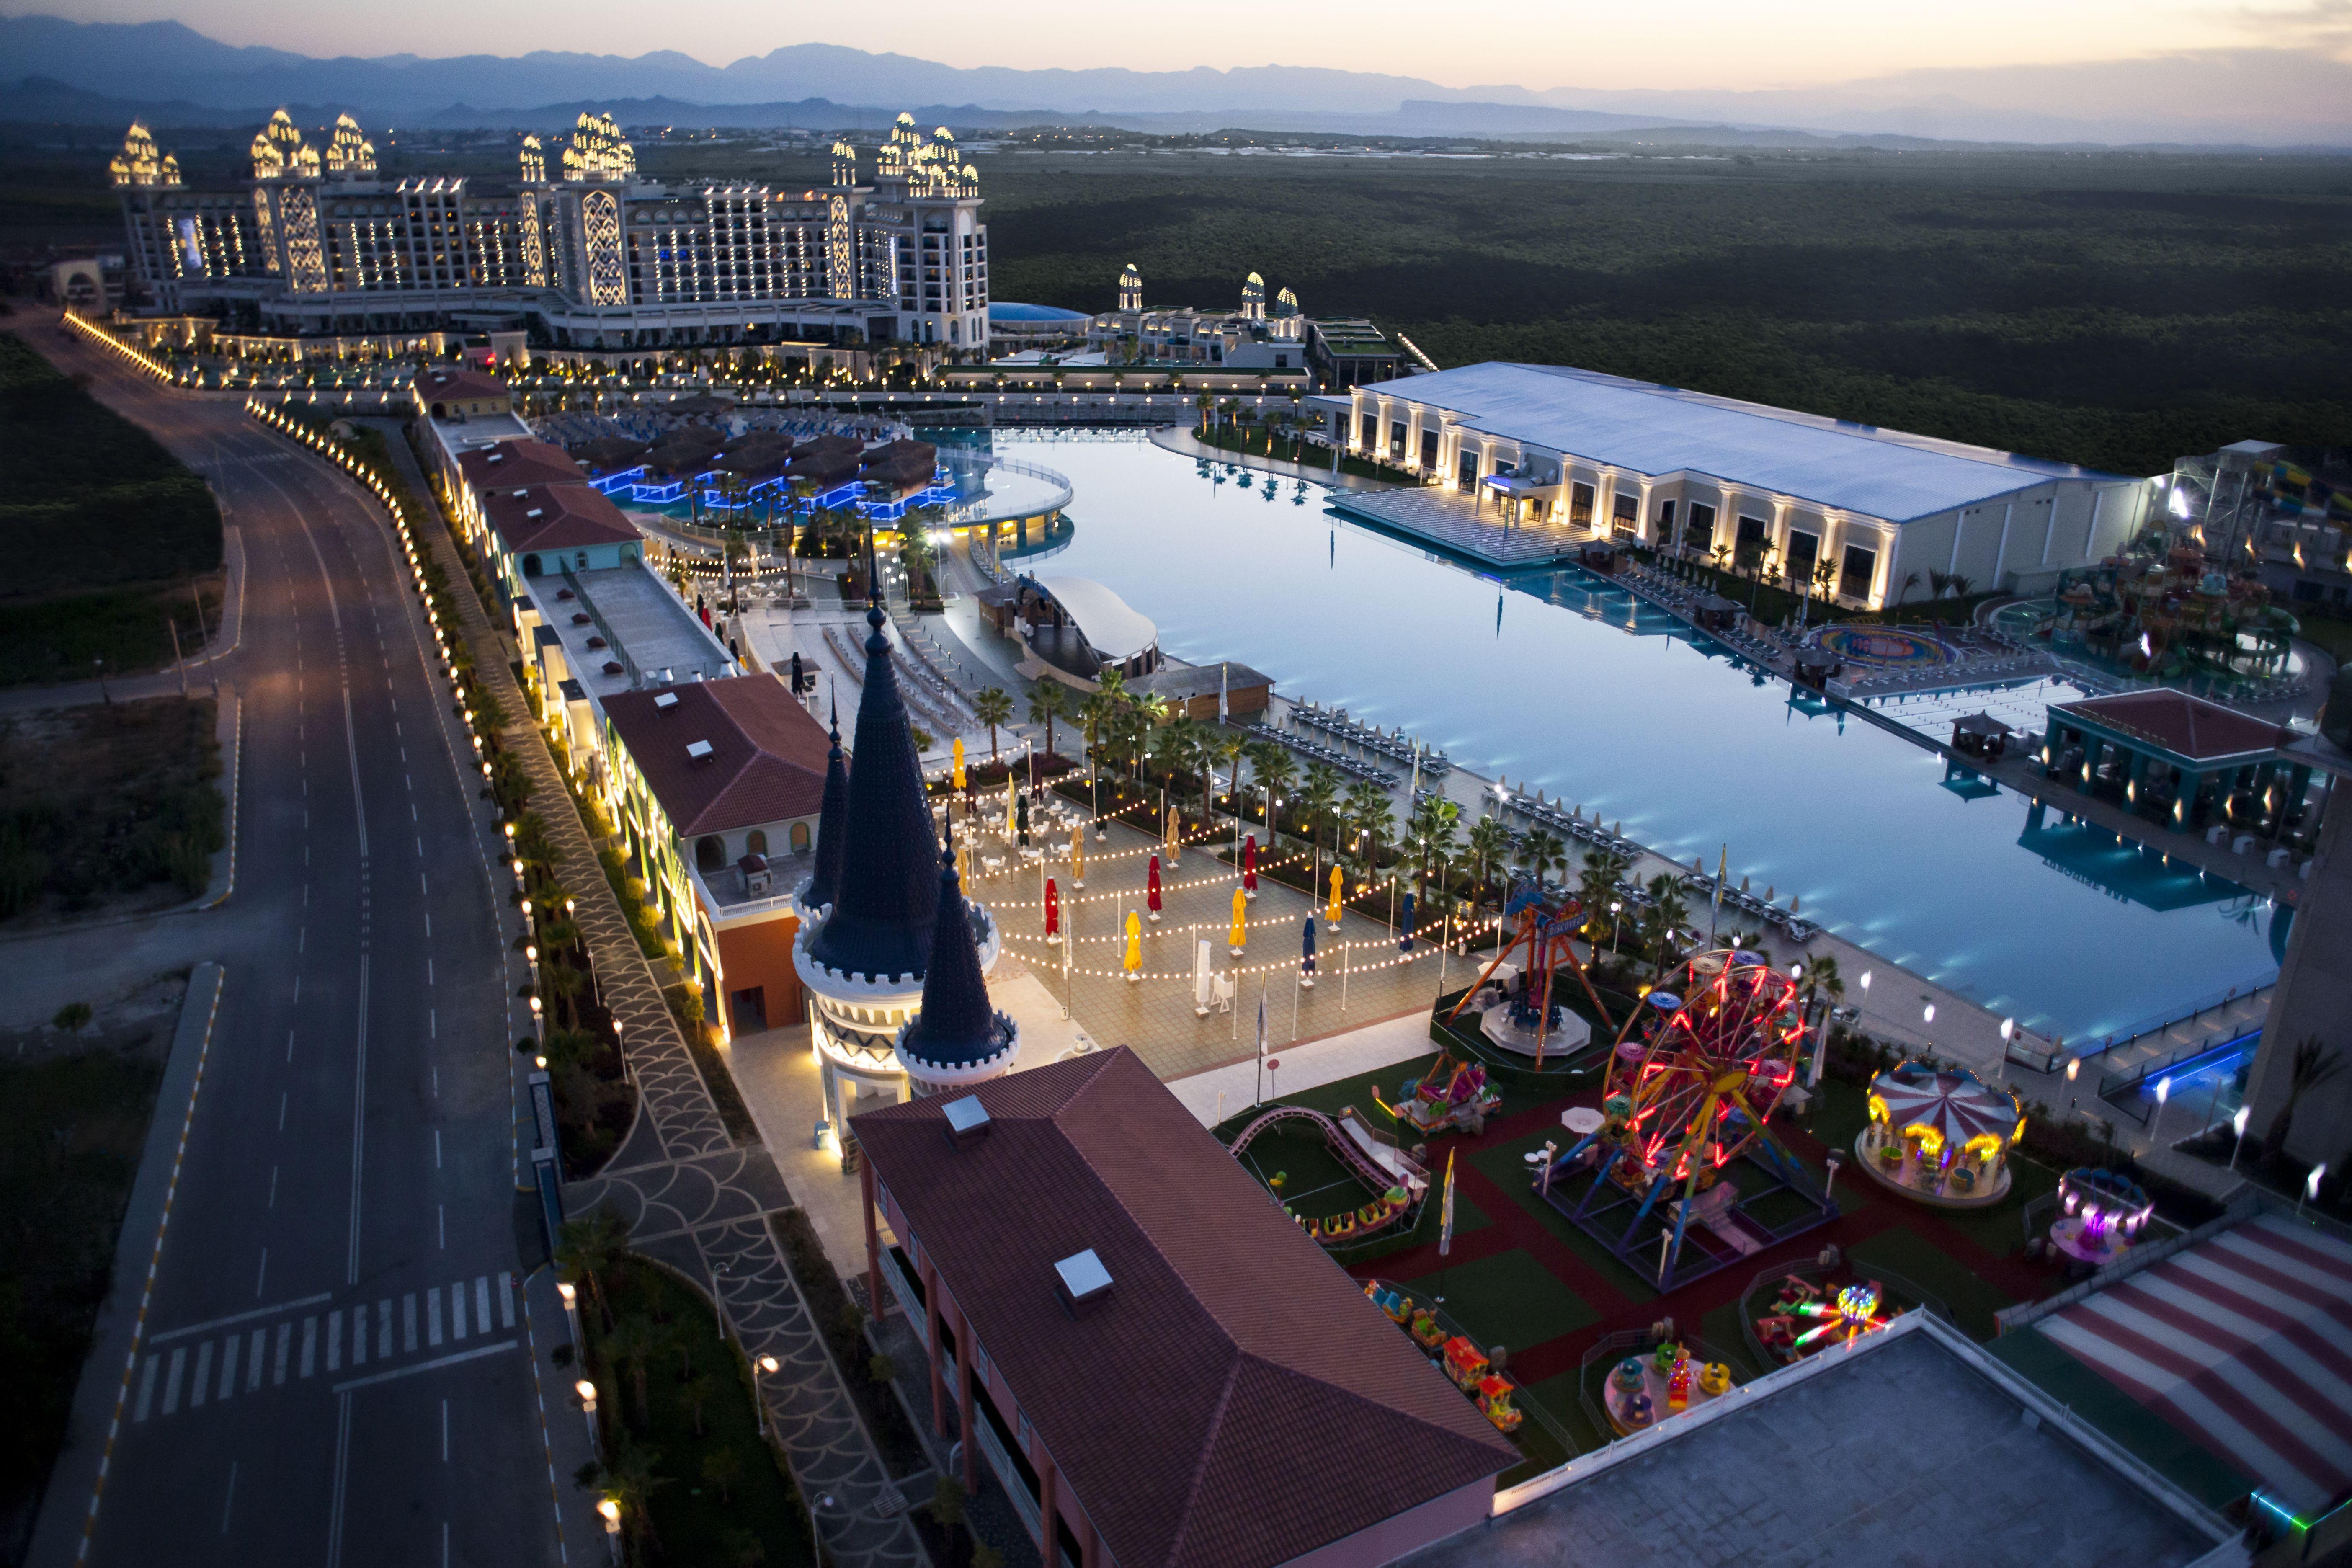 Granada Luxury Hotel Is One Of The Wedding Hotels In Antalya Hotel Wedding Hotels In Turkey Antalya